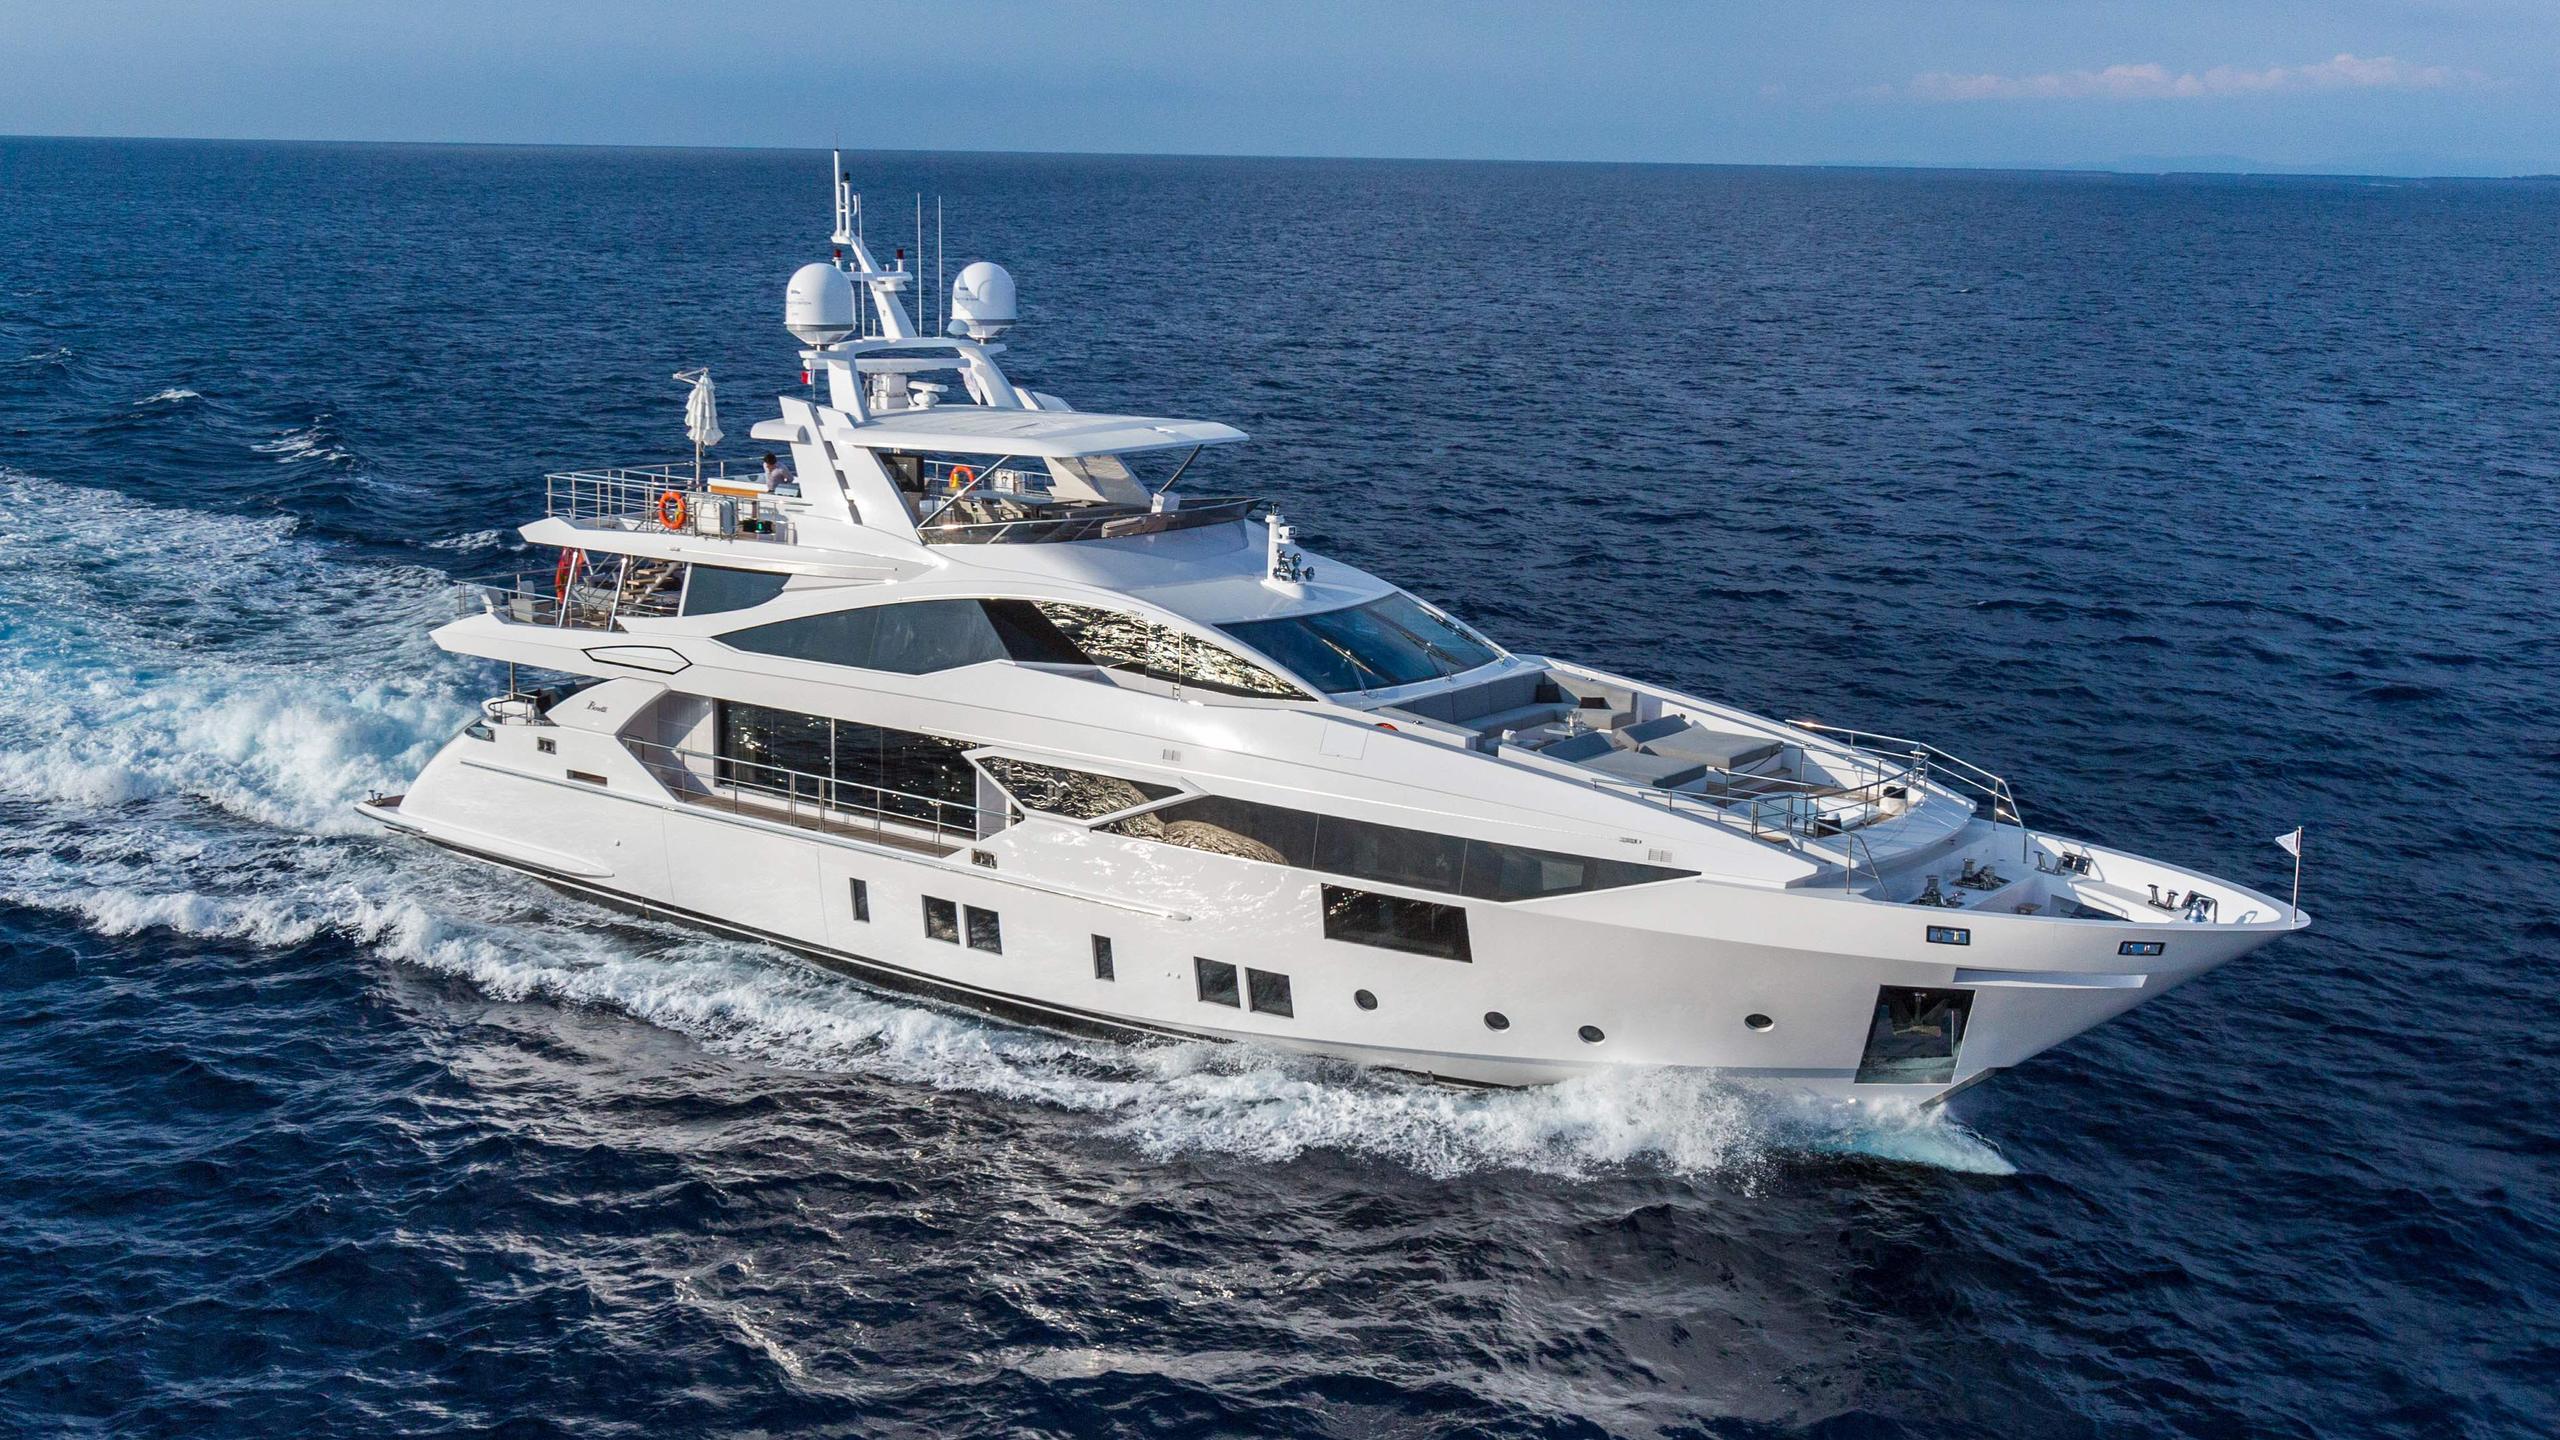 my-way-motoryacht-benetti-vivace-125-2018-38m-running-half-profile-sistership